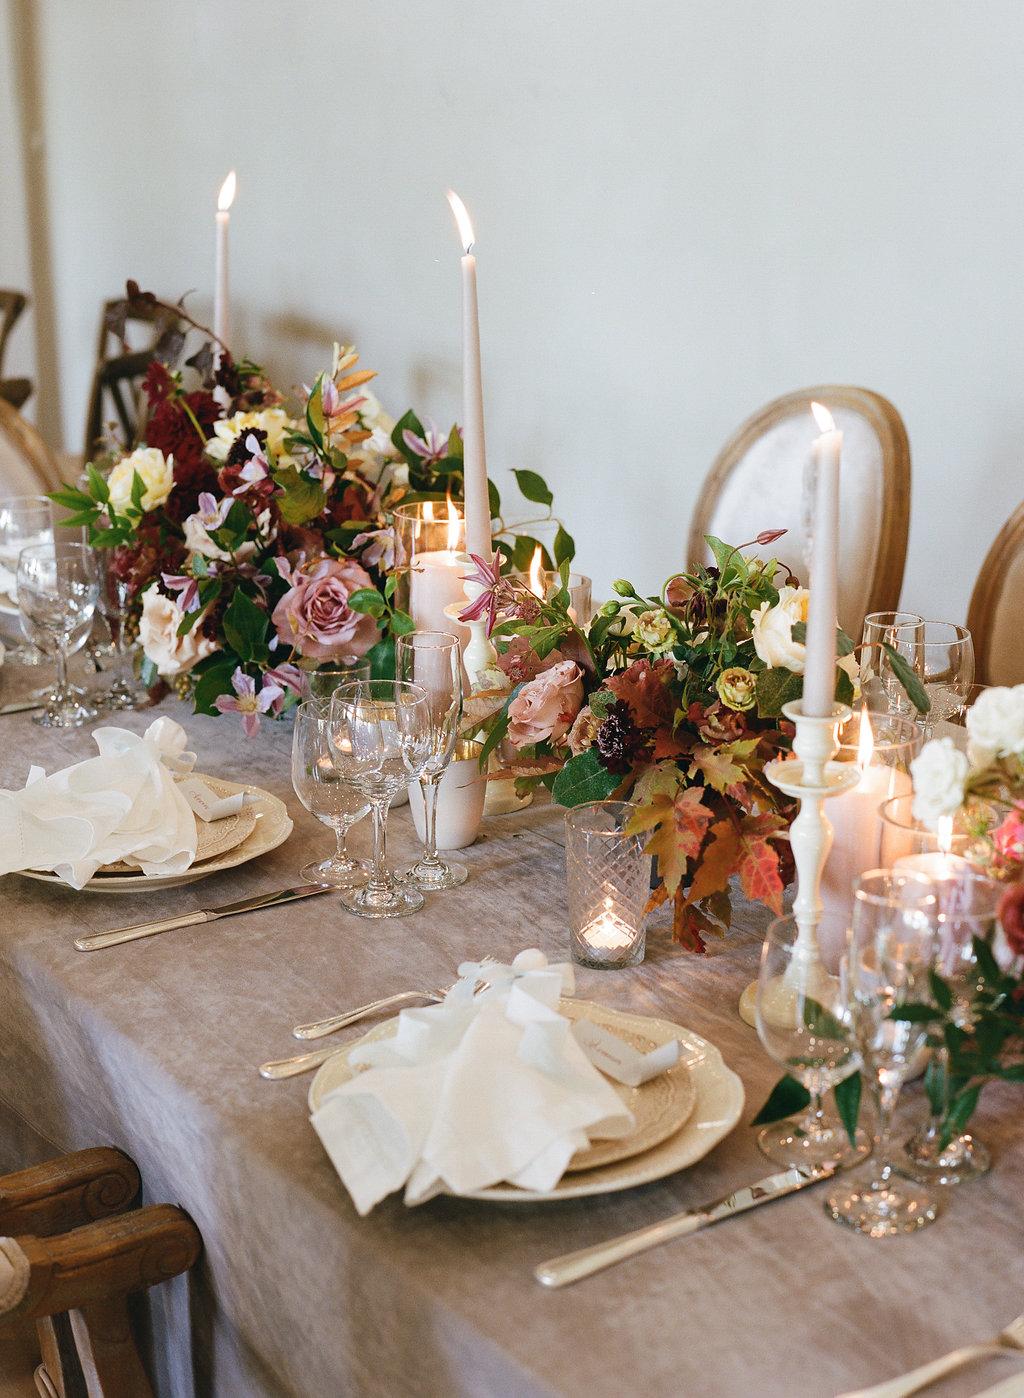 Chinese-American summer-to-fall wedding featured in   Martha Stewart Weddings